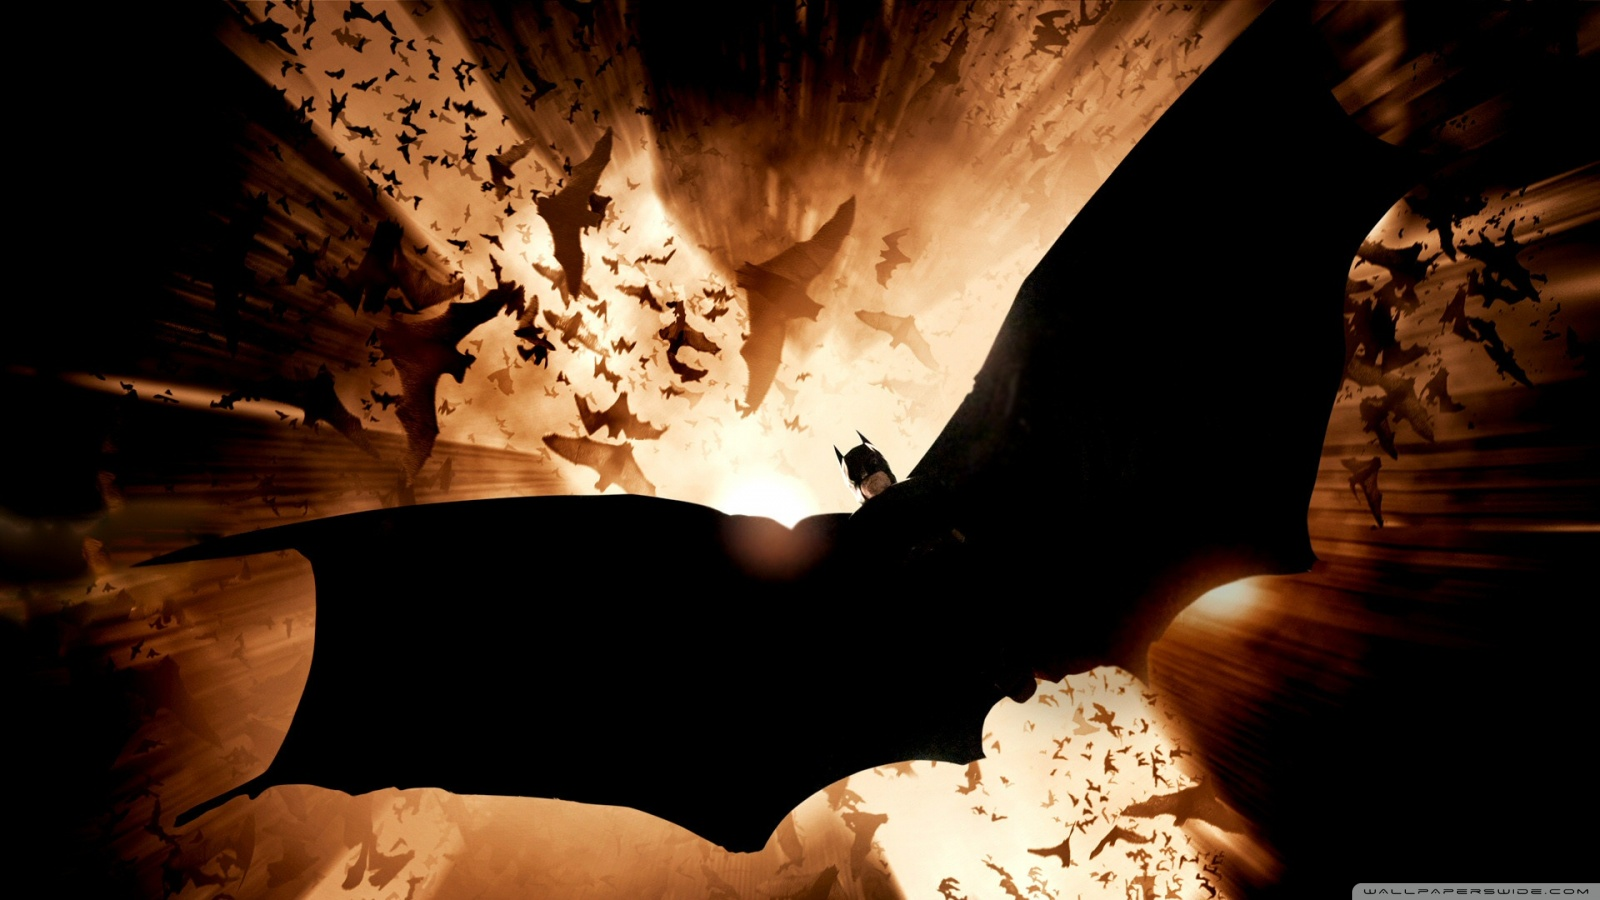 Batman Begins International Trailer Analysis